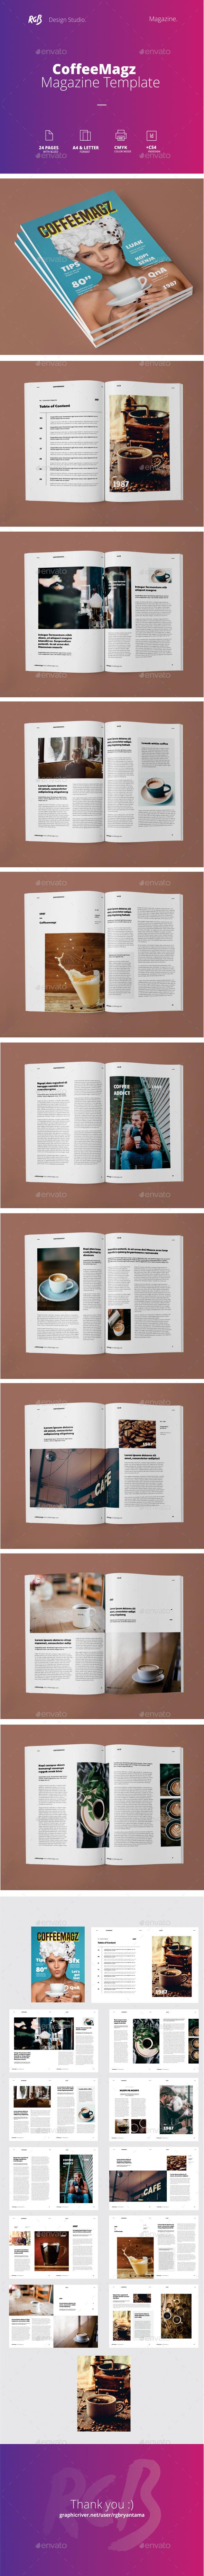 CoffeeMagz Magazine Template - Magazines Print Templates